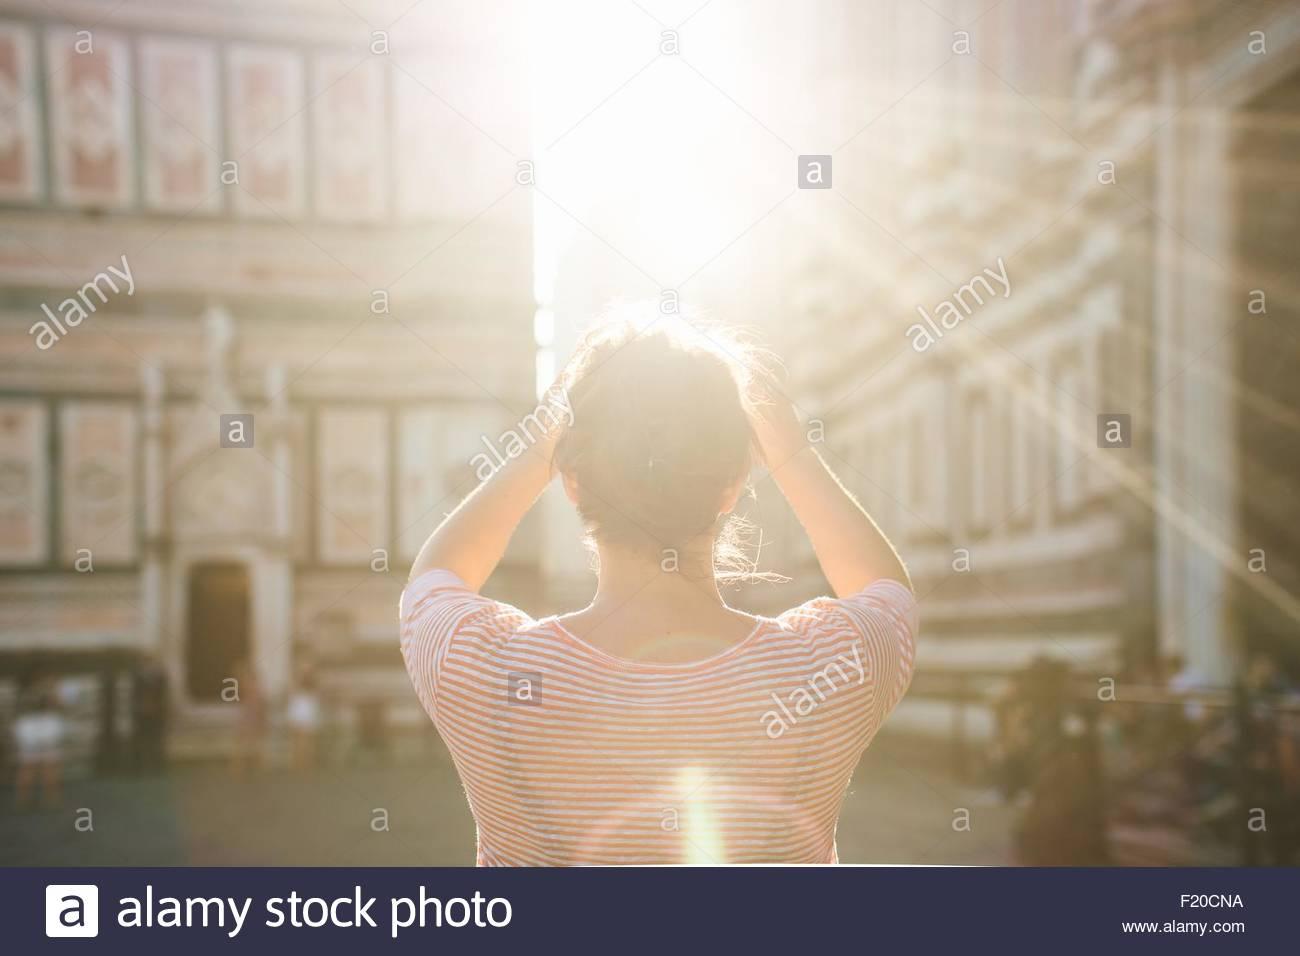 Rückansicht der Mitte Erwachsene Frau, erhobenen Armen, lens Flare, Dom, Florenz, Italien Stockbild